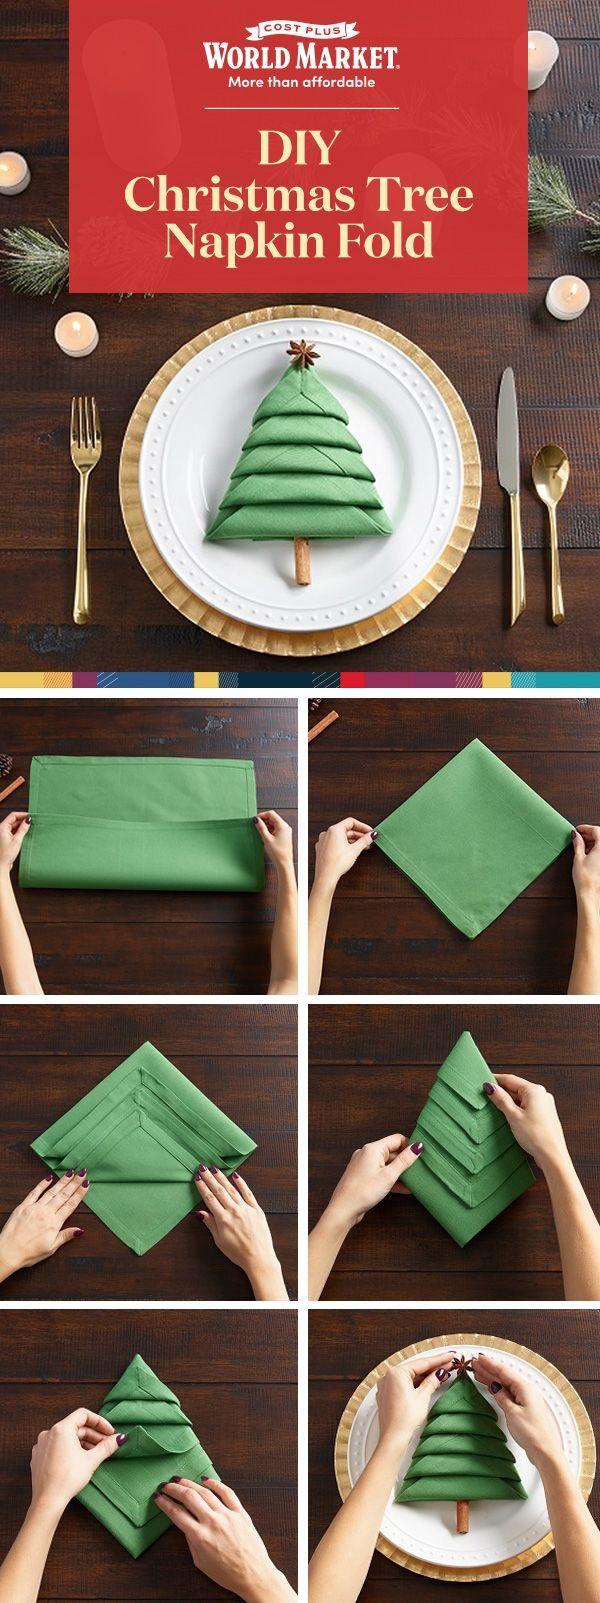 Christmas Tree Napkin Foldinghow Toideas Tipsinspiration Christmas Tree Napkin Fold Christmas Tree Napkins Christmas Diy